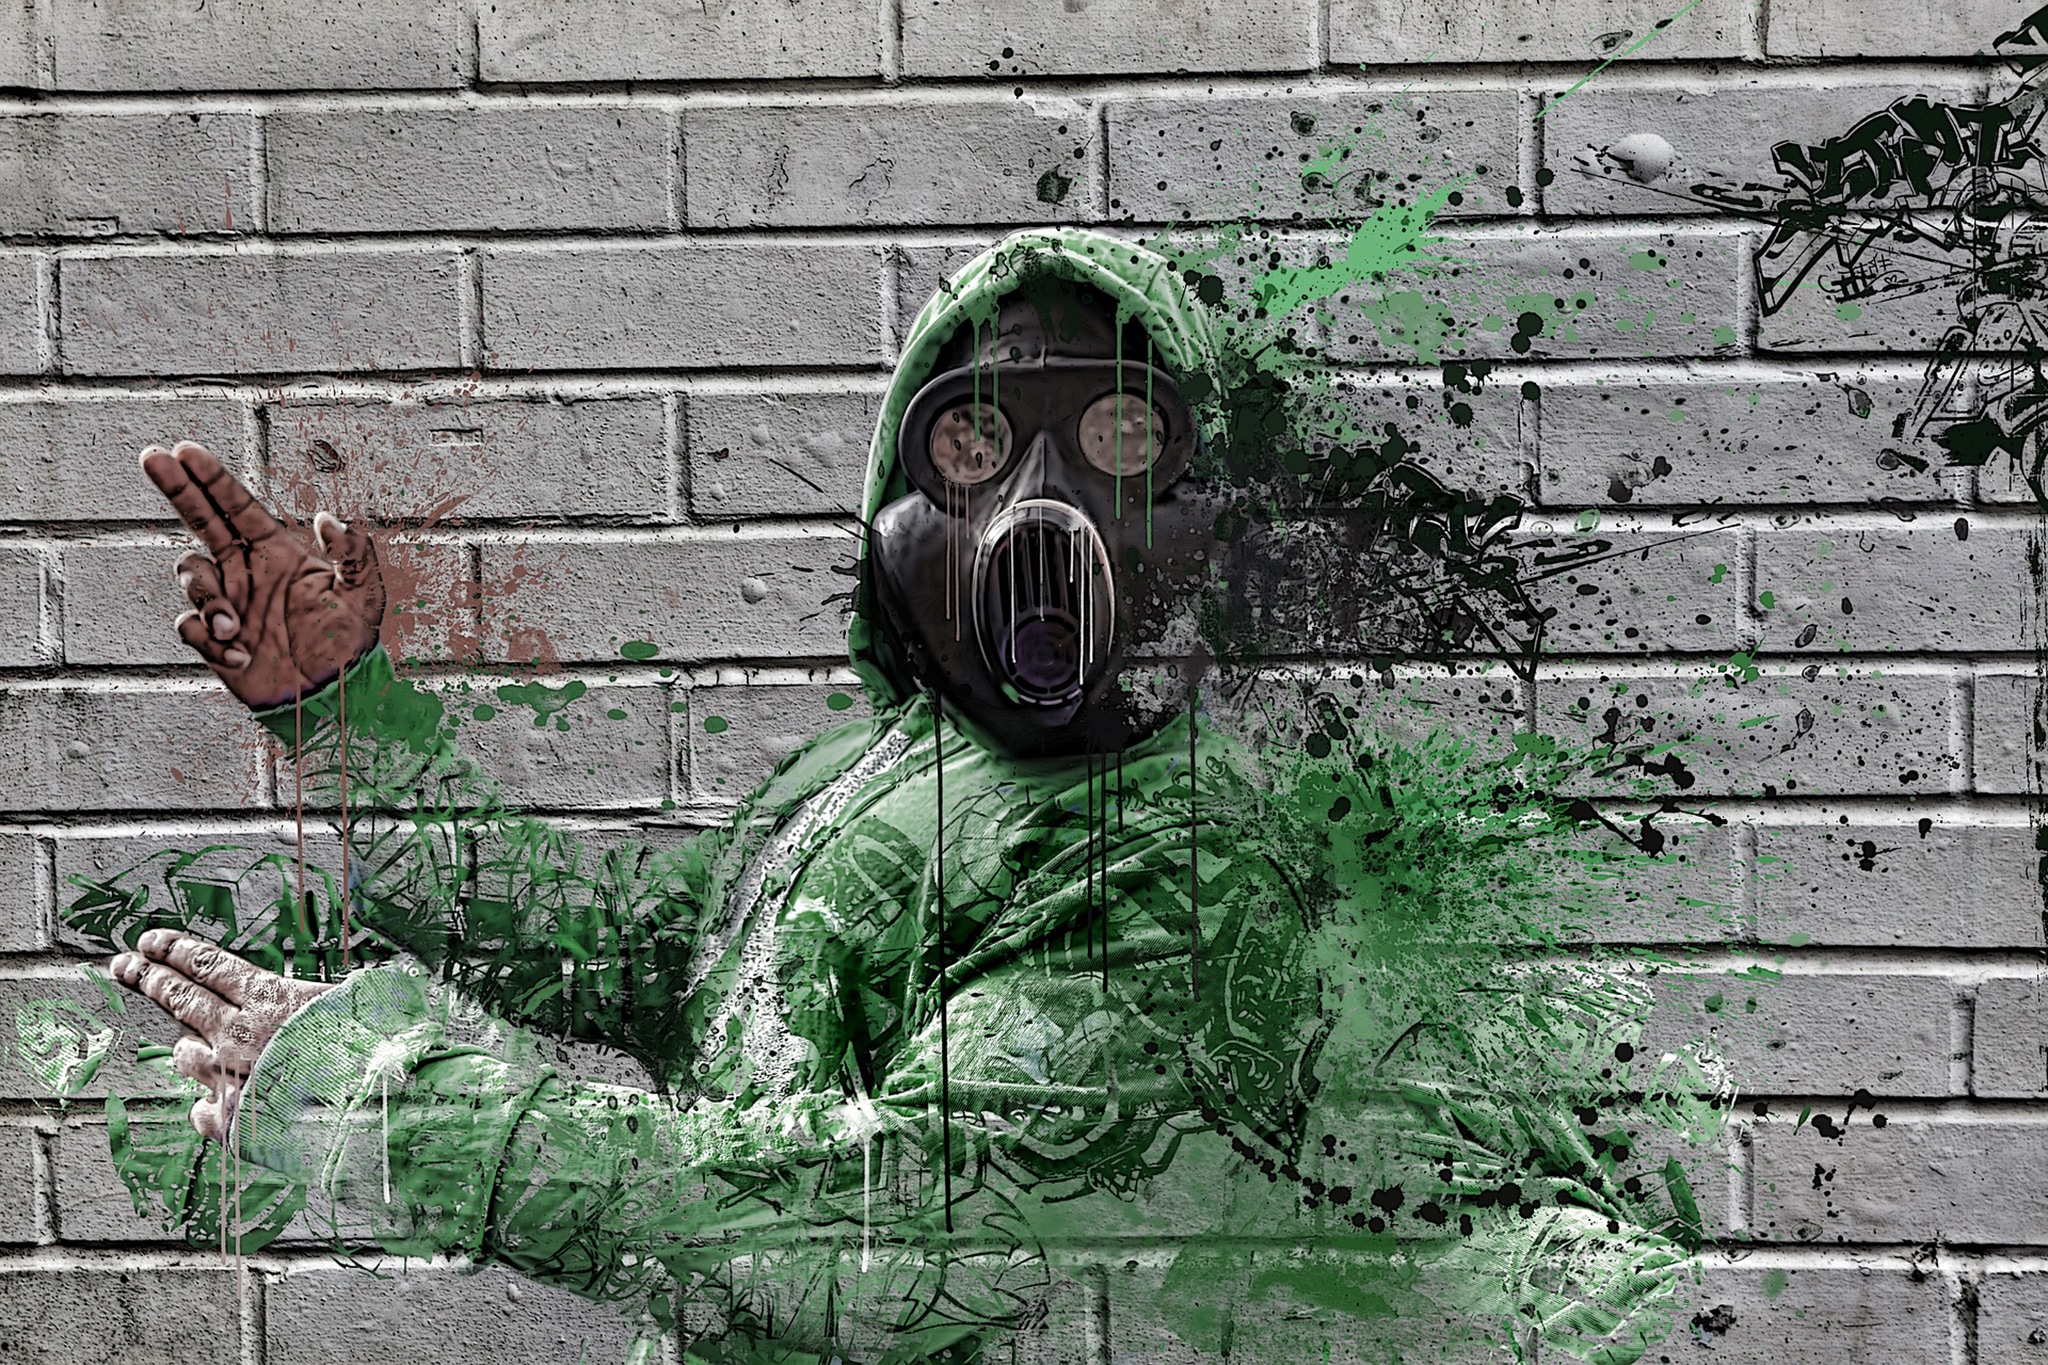 jugendkulturjahr-2020-ratingen-jkj2020-graffiti-trafohaeuschen-stadtwerke-ratingen-1